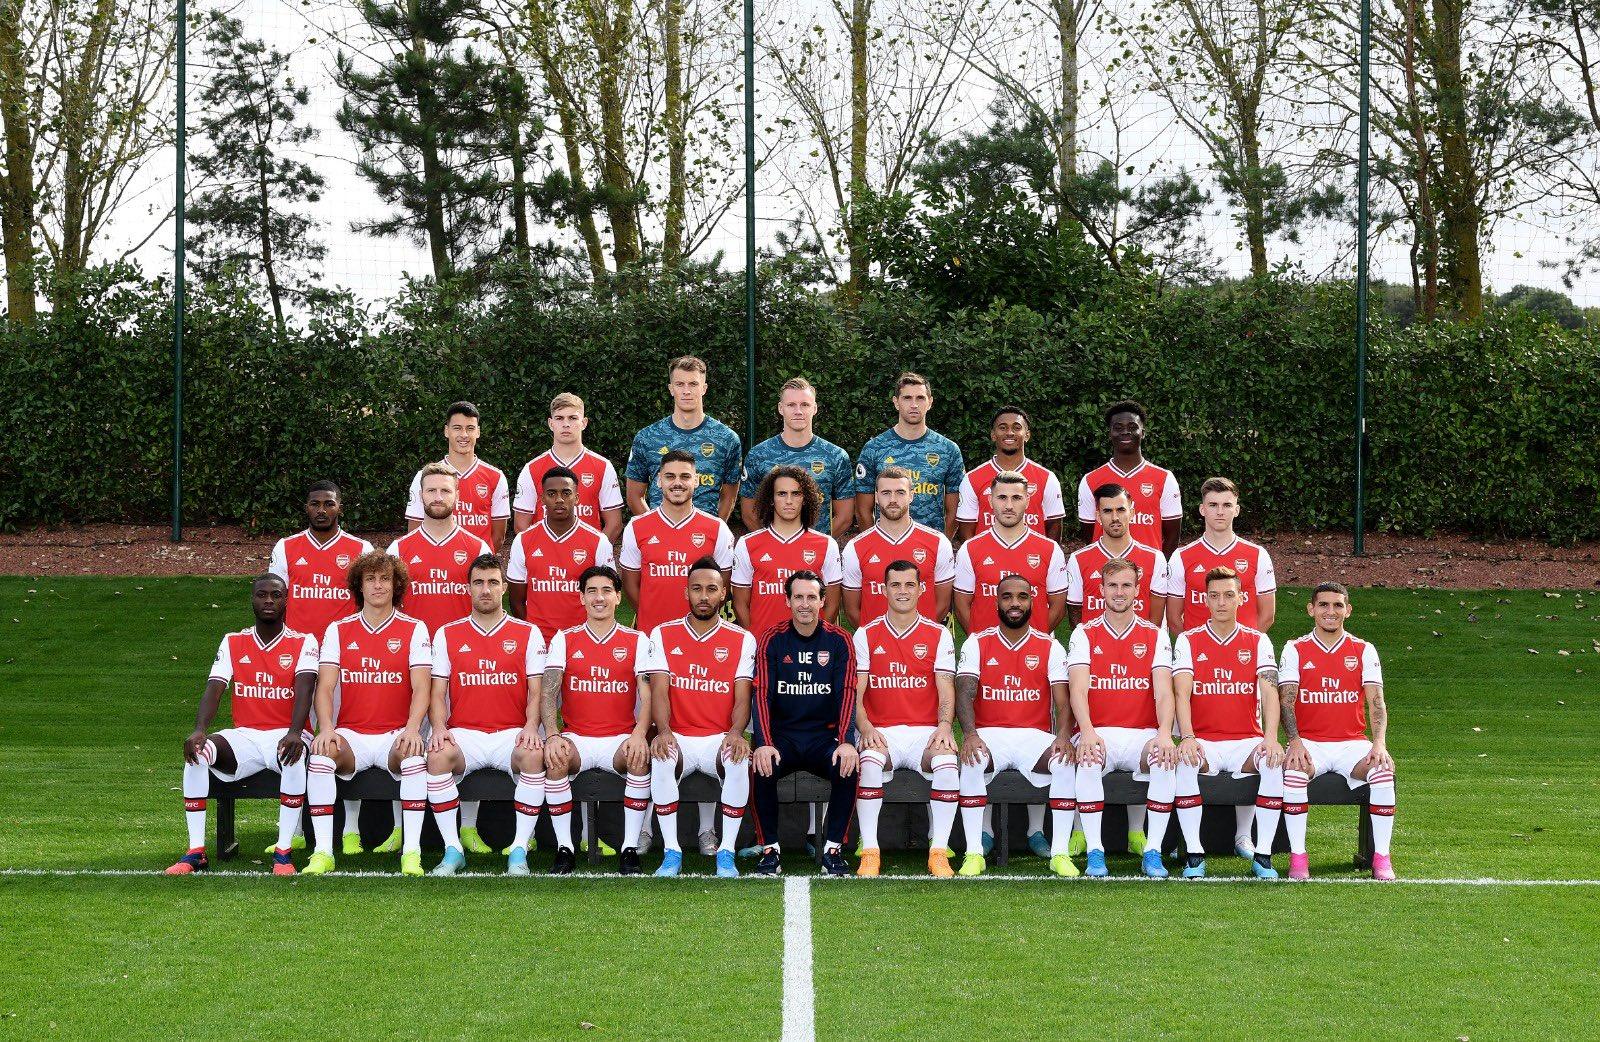 Hilo del Arsenal EFivBFXXUAALUtr?format=jpg&name=large